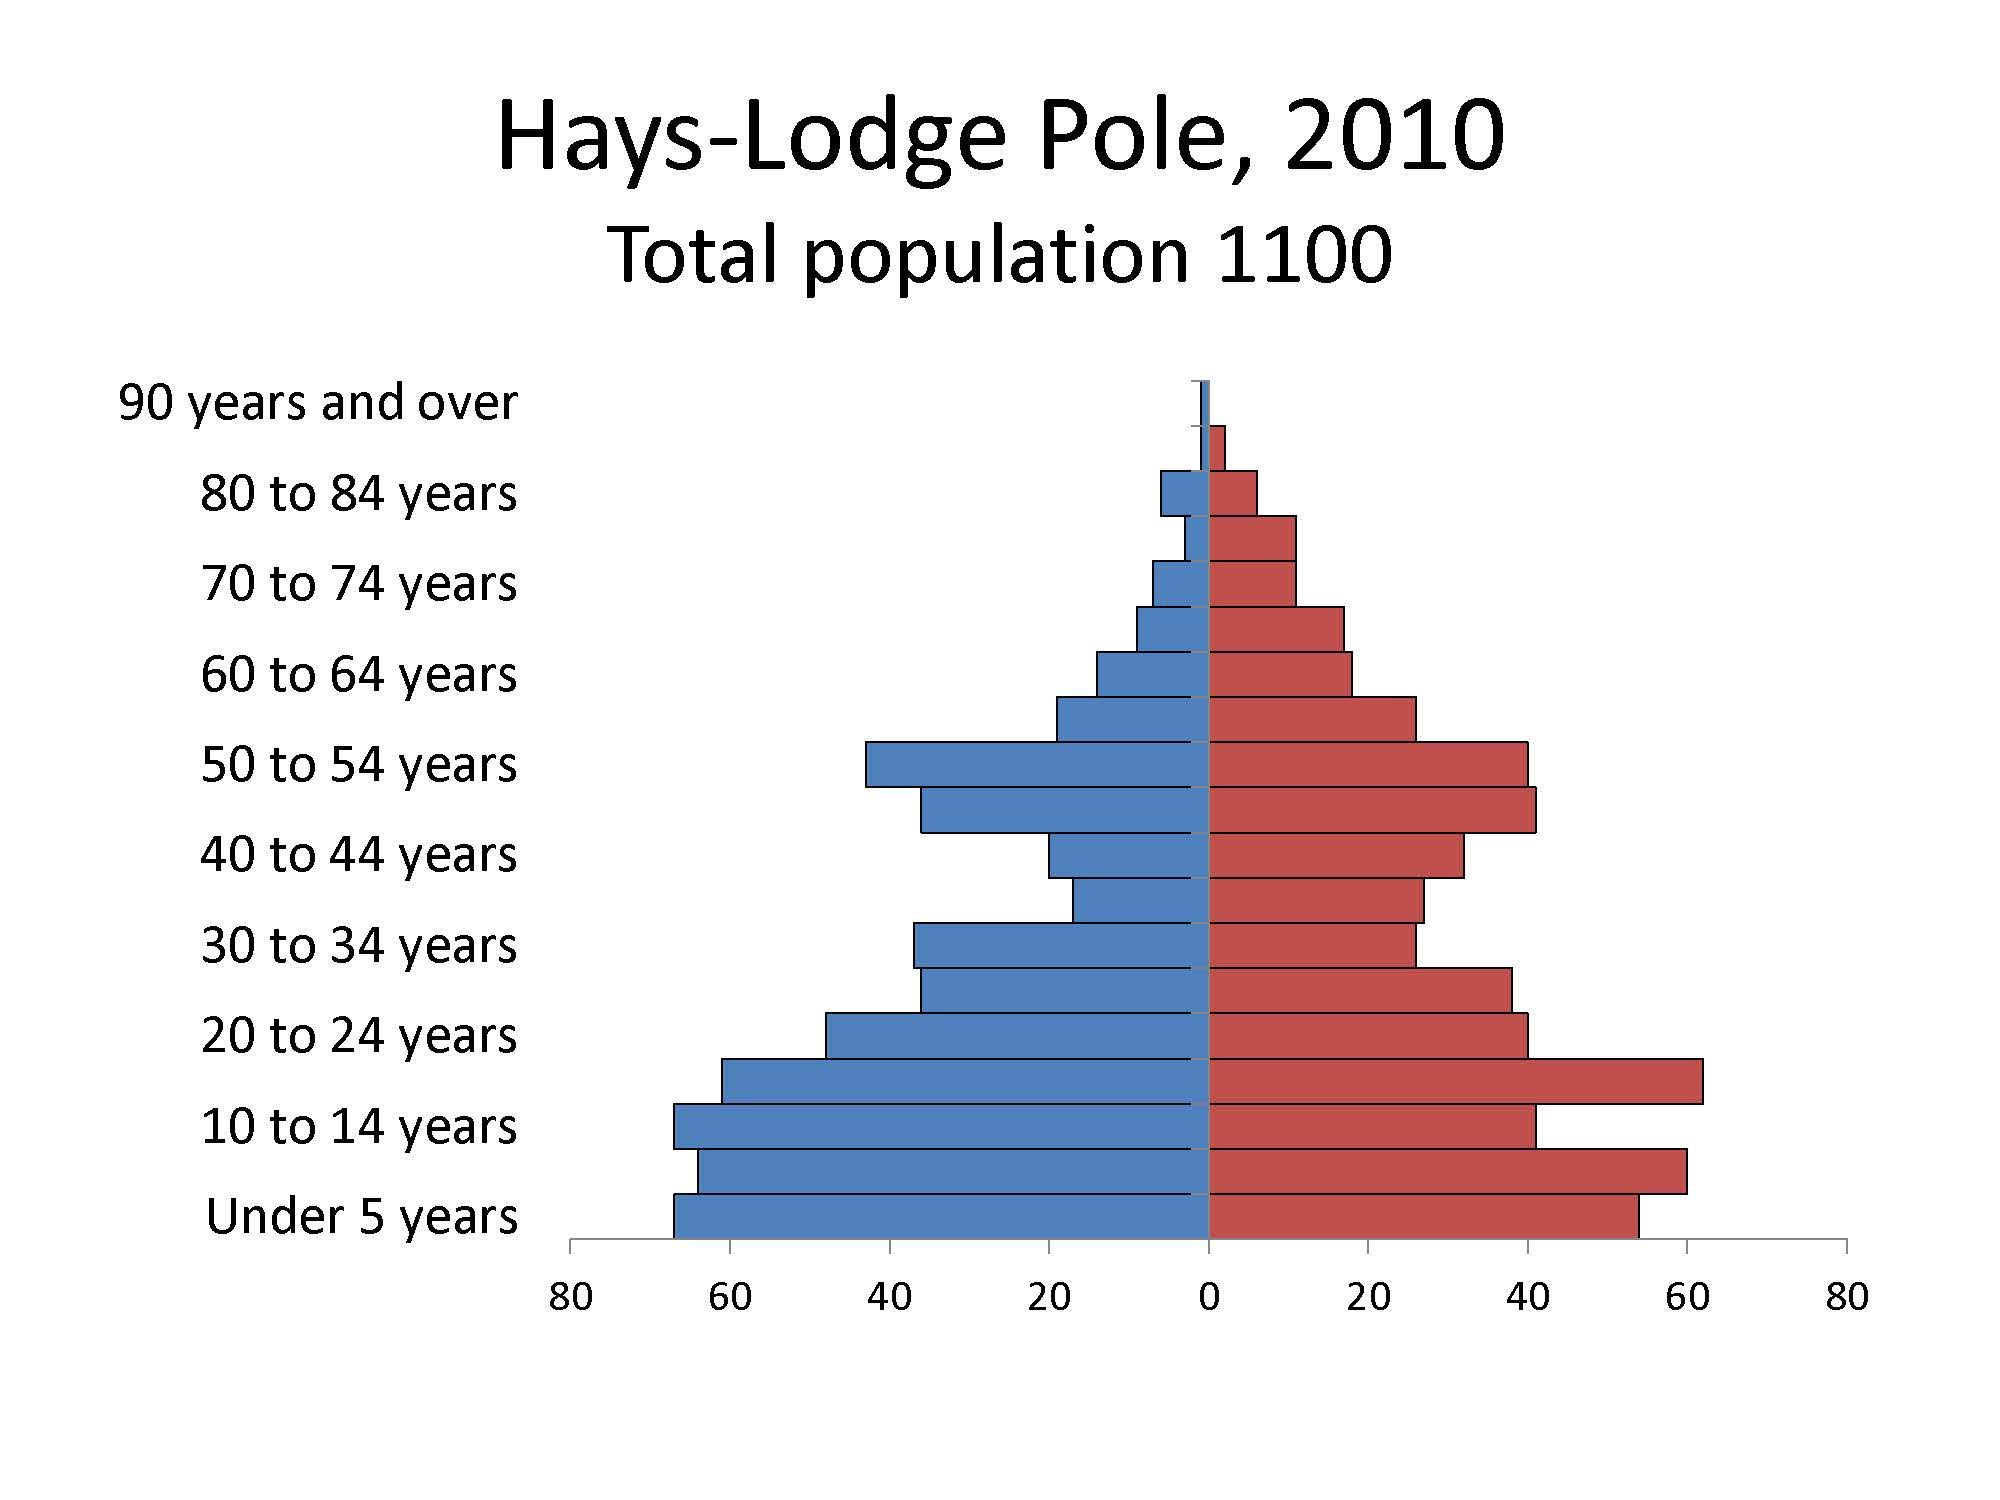 Hays-Lodgepole